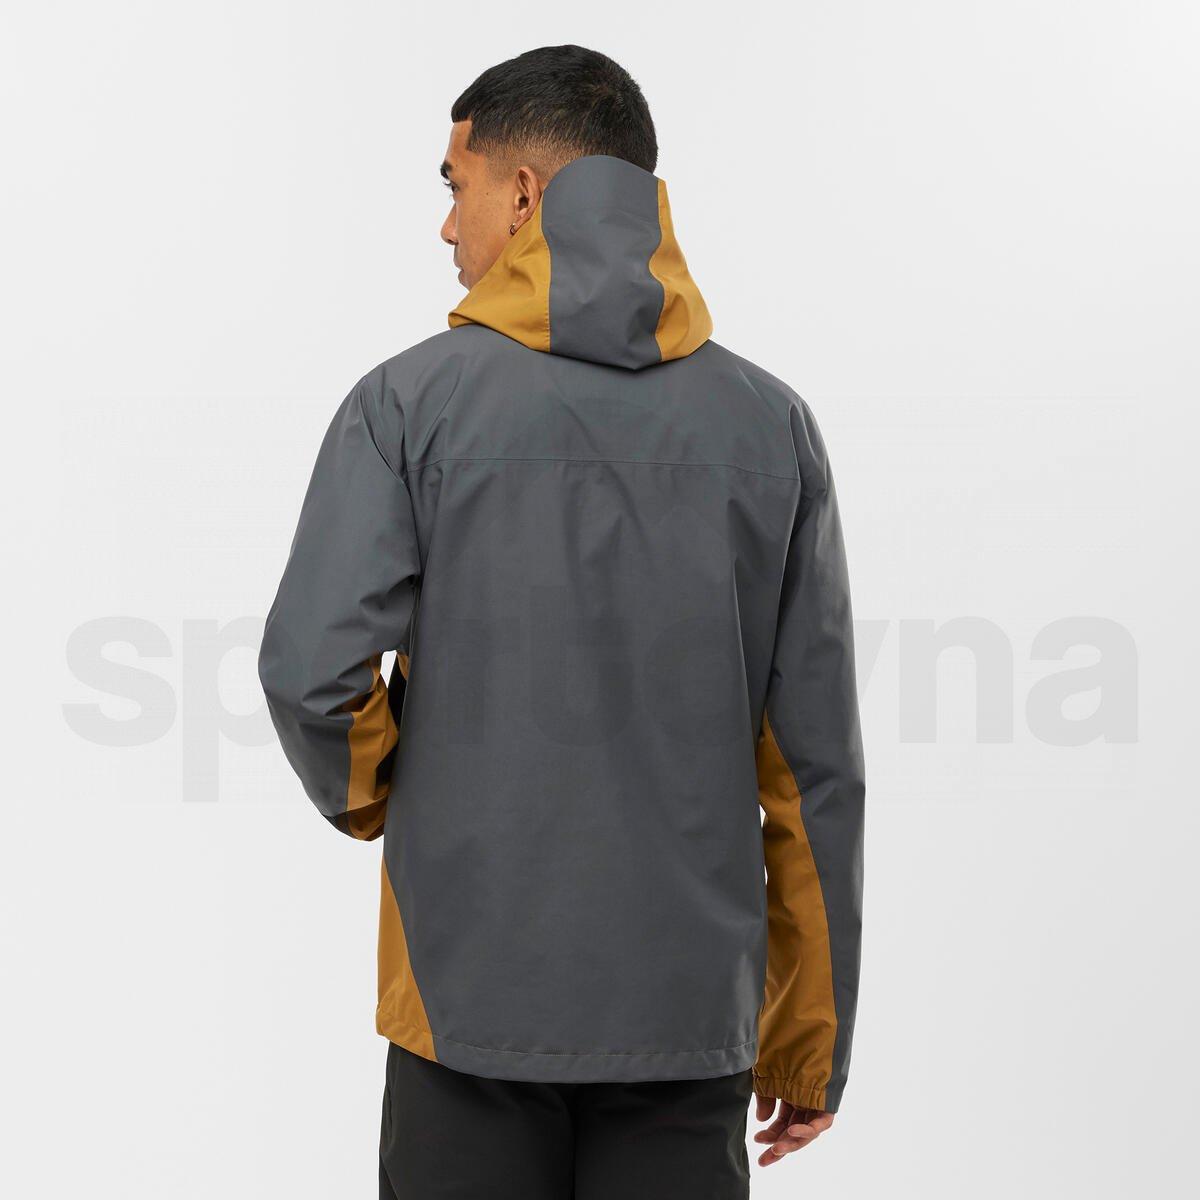 Bunda Salomon OUTLINE GTX® 2.5L JKT M - hnědá/šedá